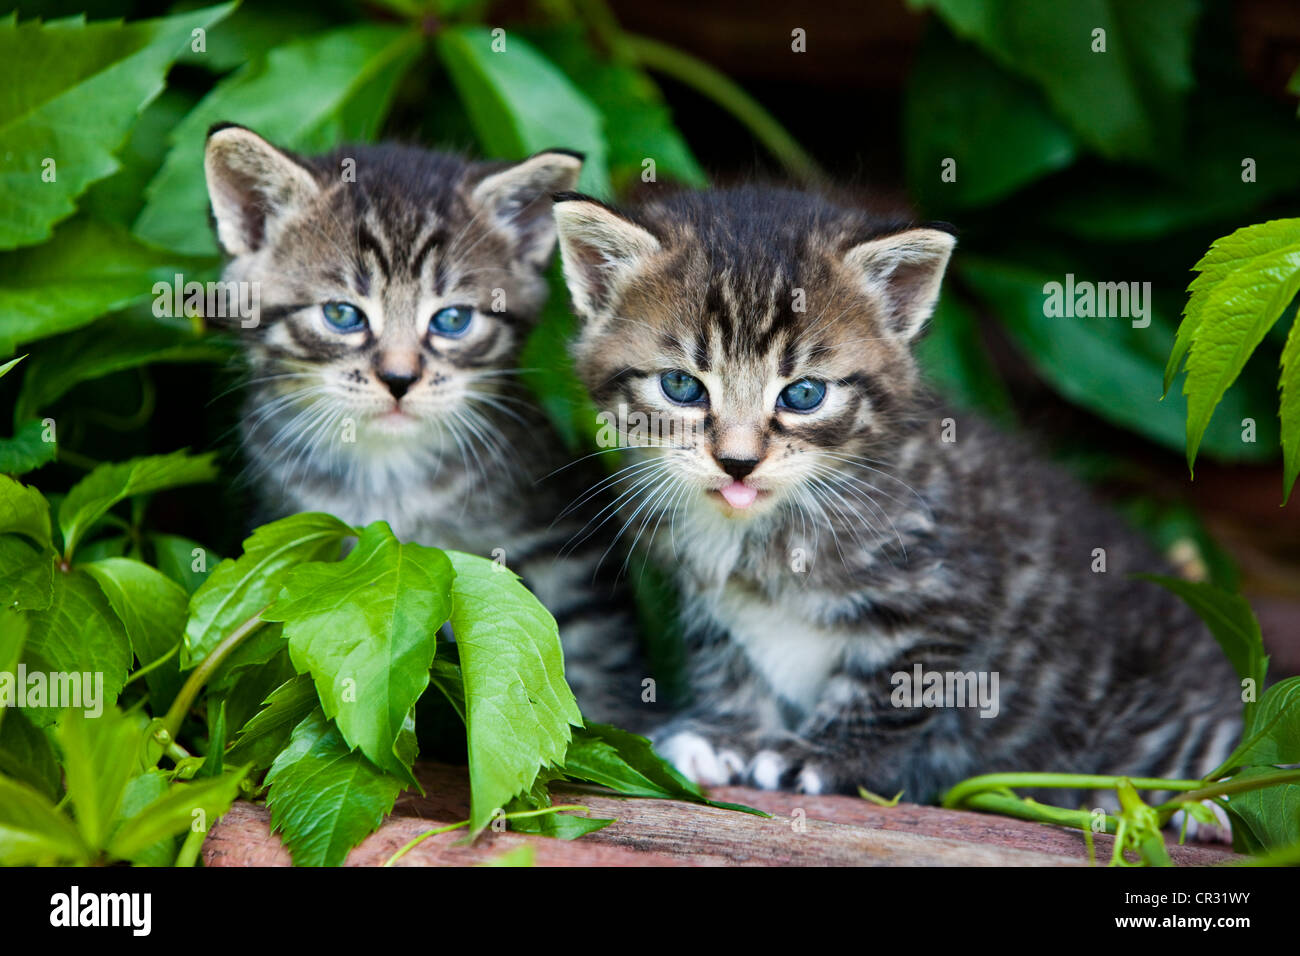 Deux chats domestiques tabby gris, chatons, Tyrol du Nord, l'Autriche, Europe Photo Stock